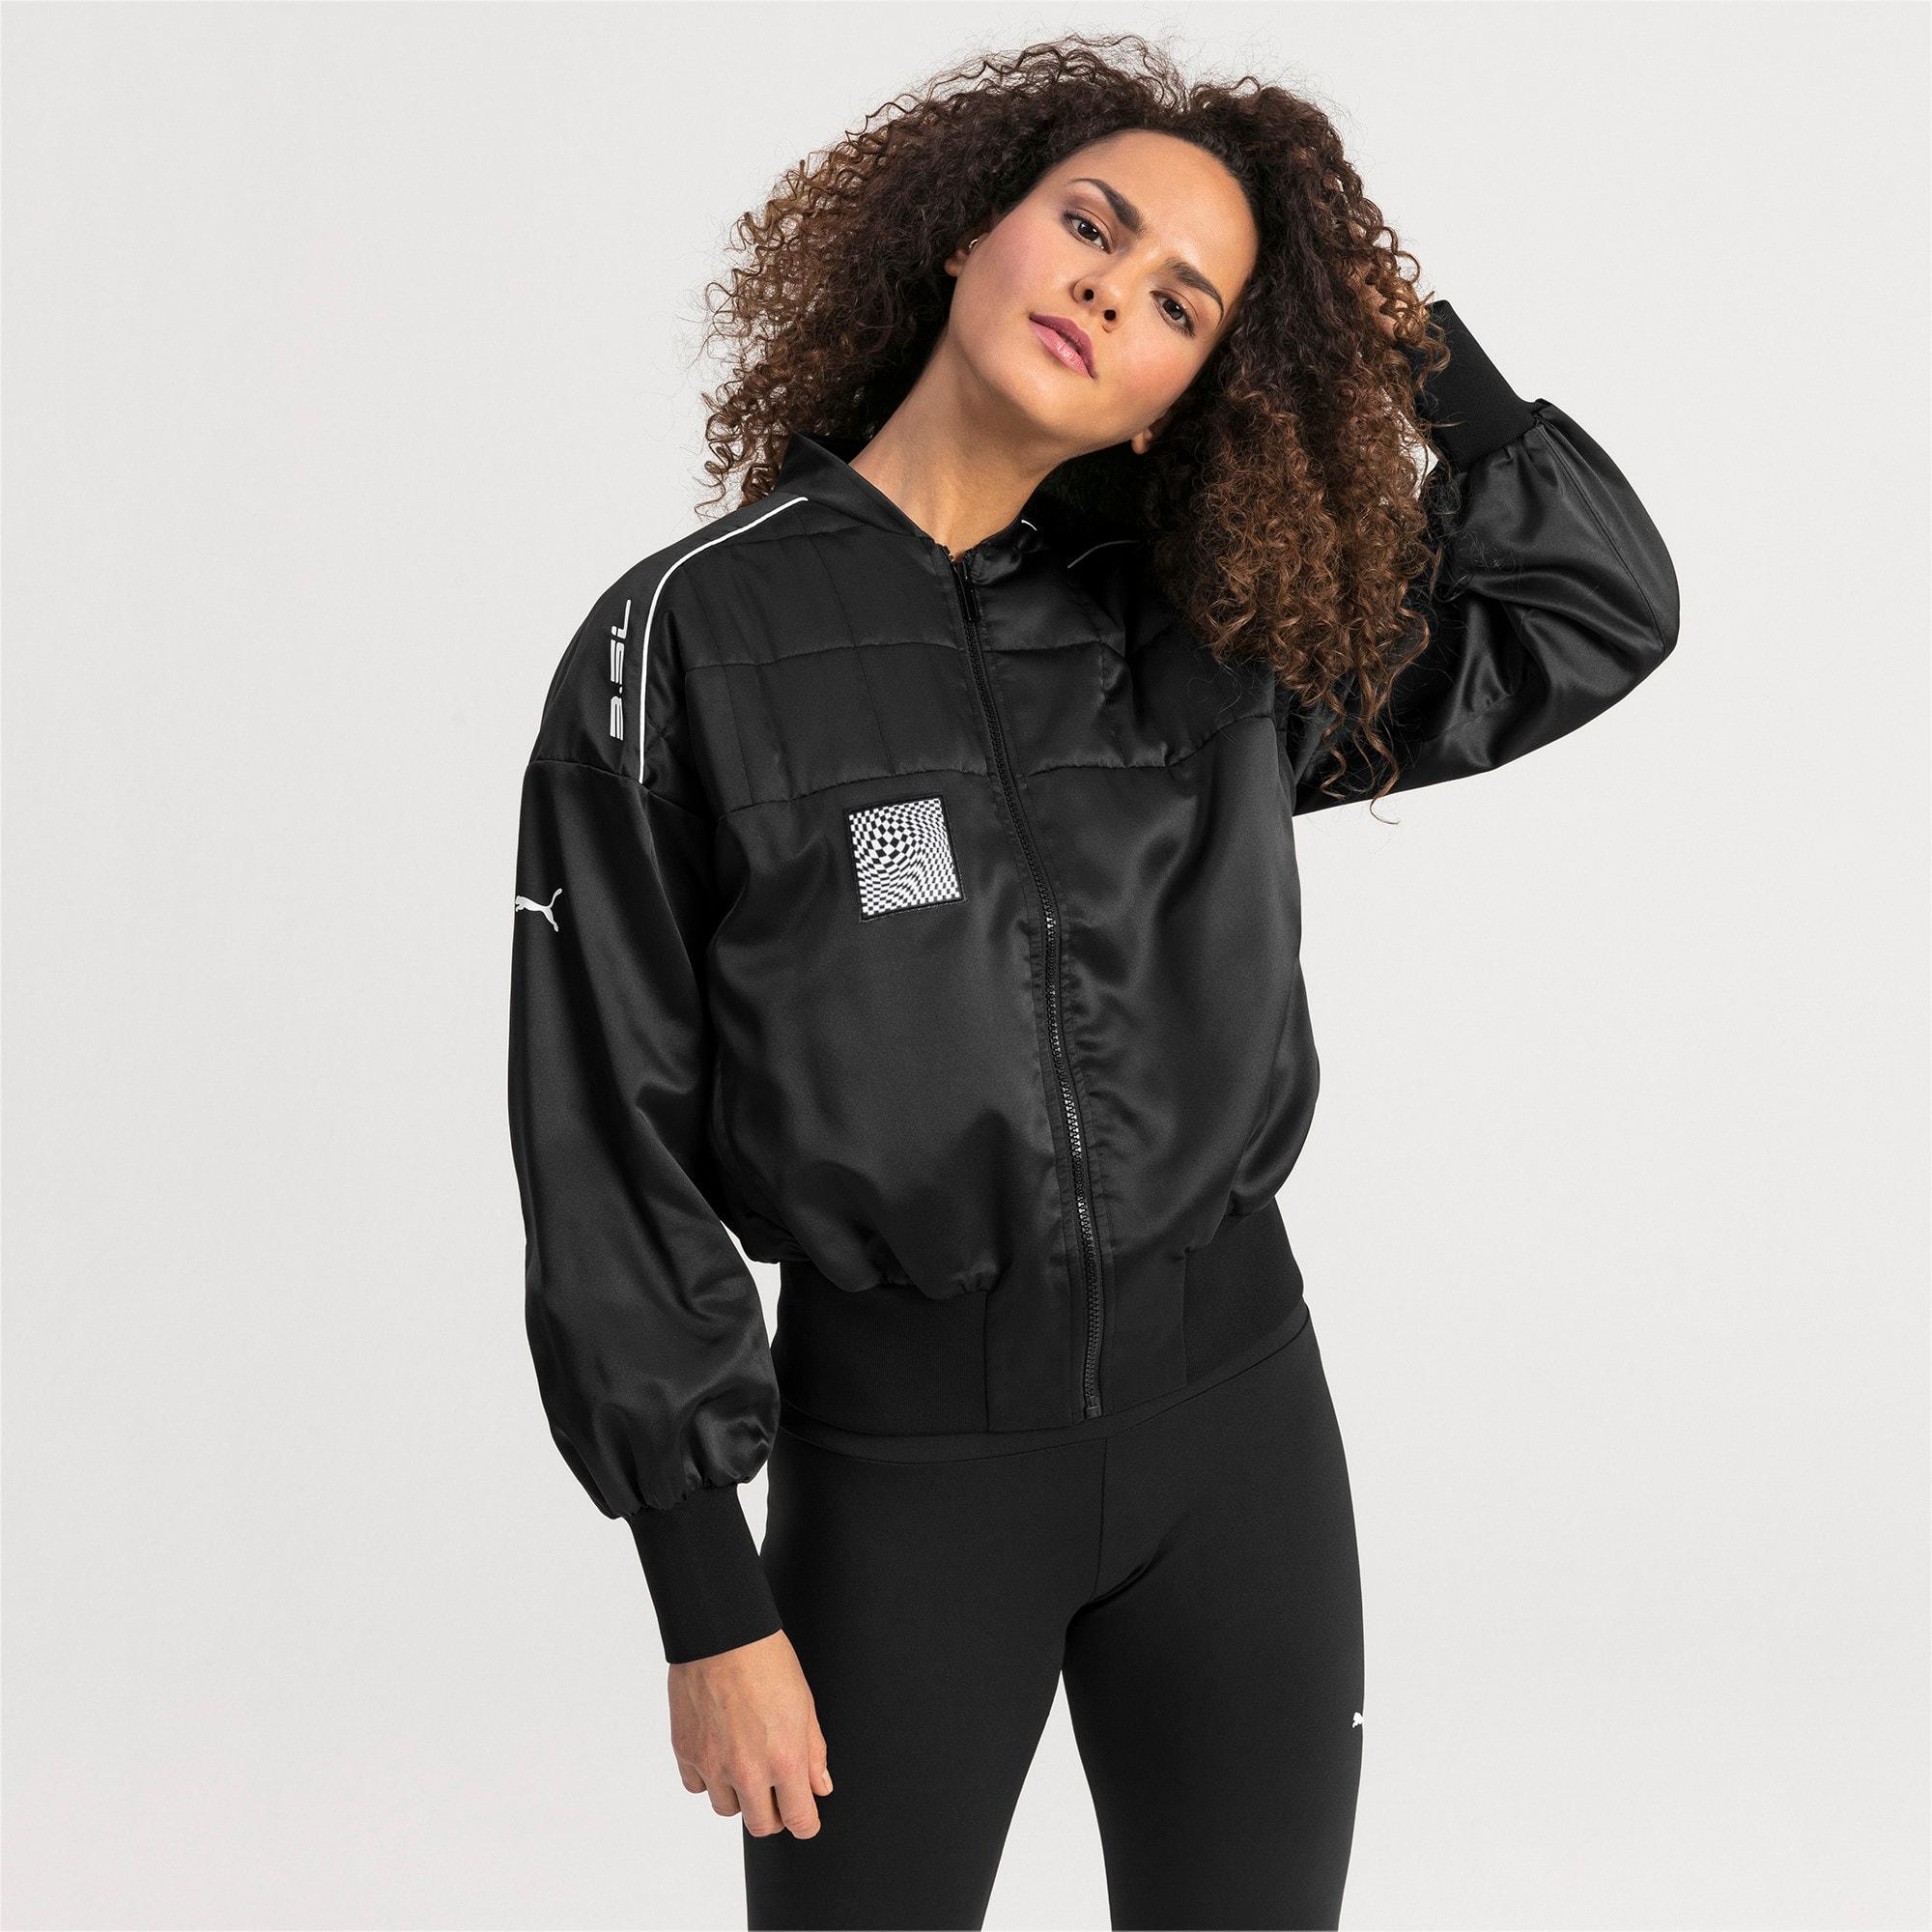 Thumbnail 1 of BMW M Motorsport Women's Street Jacket, Puma Black, medium